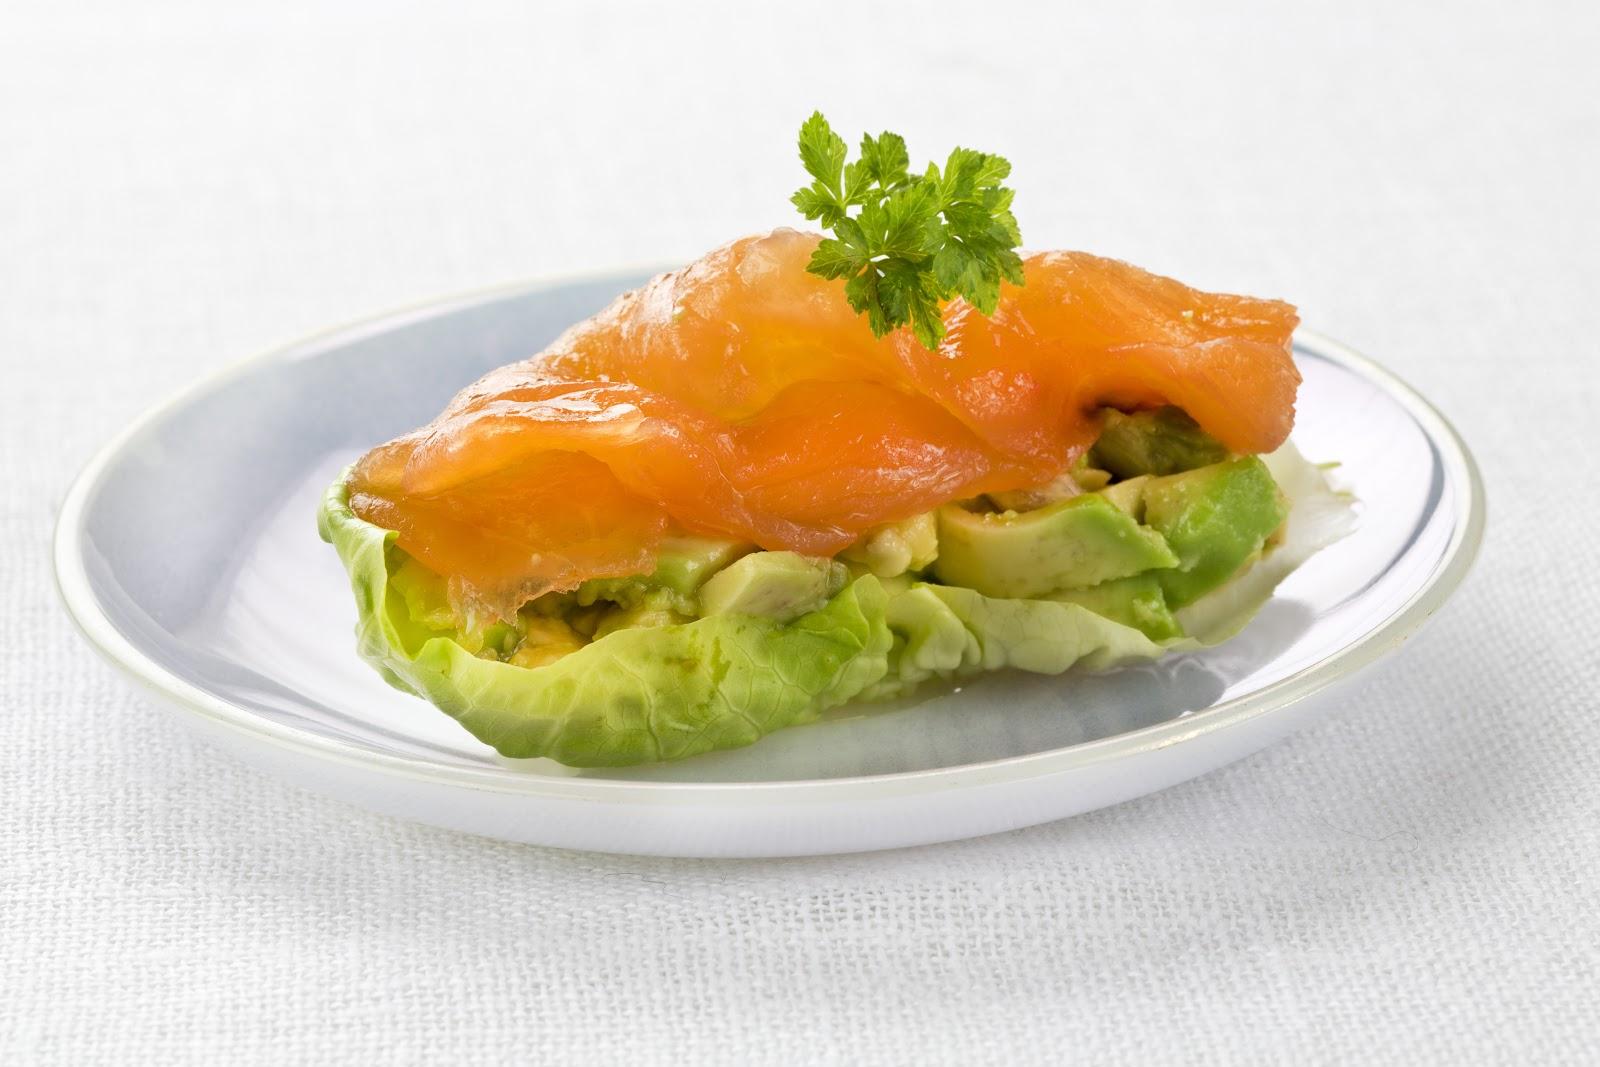 Mdcocinaymas tapas con salm n noruego ahumado - Tapas con salmon ahumado ...